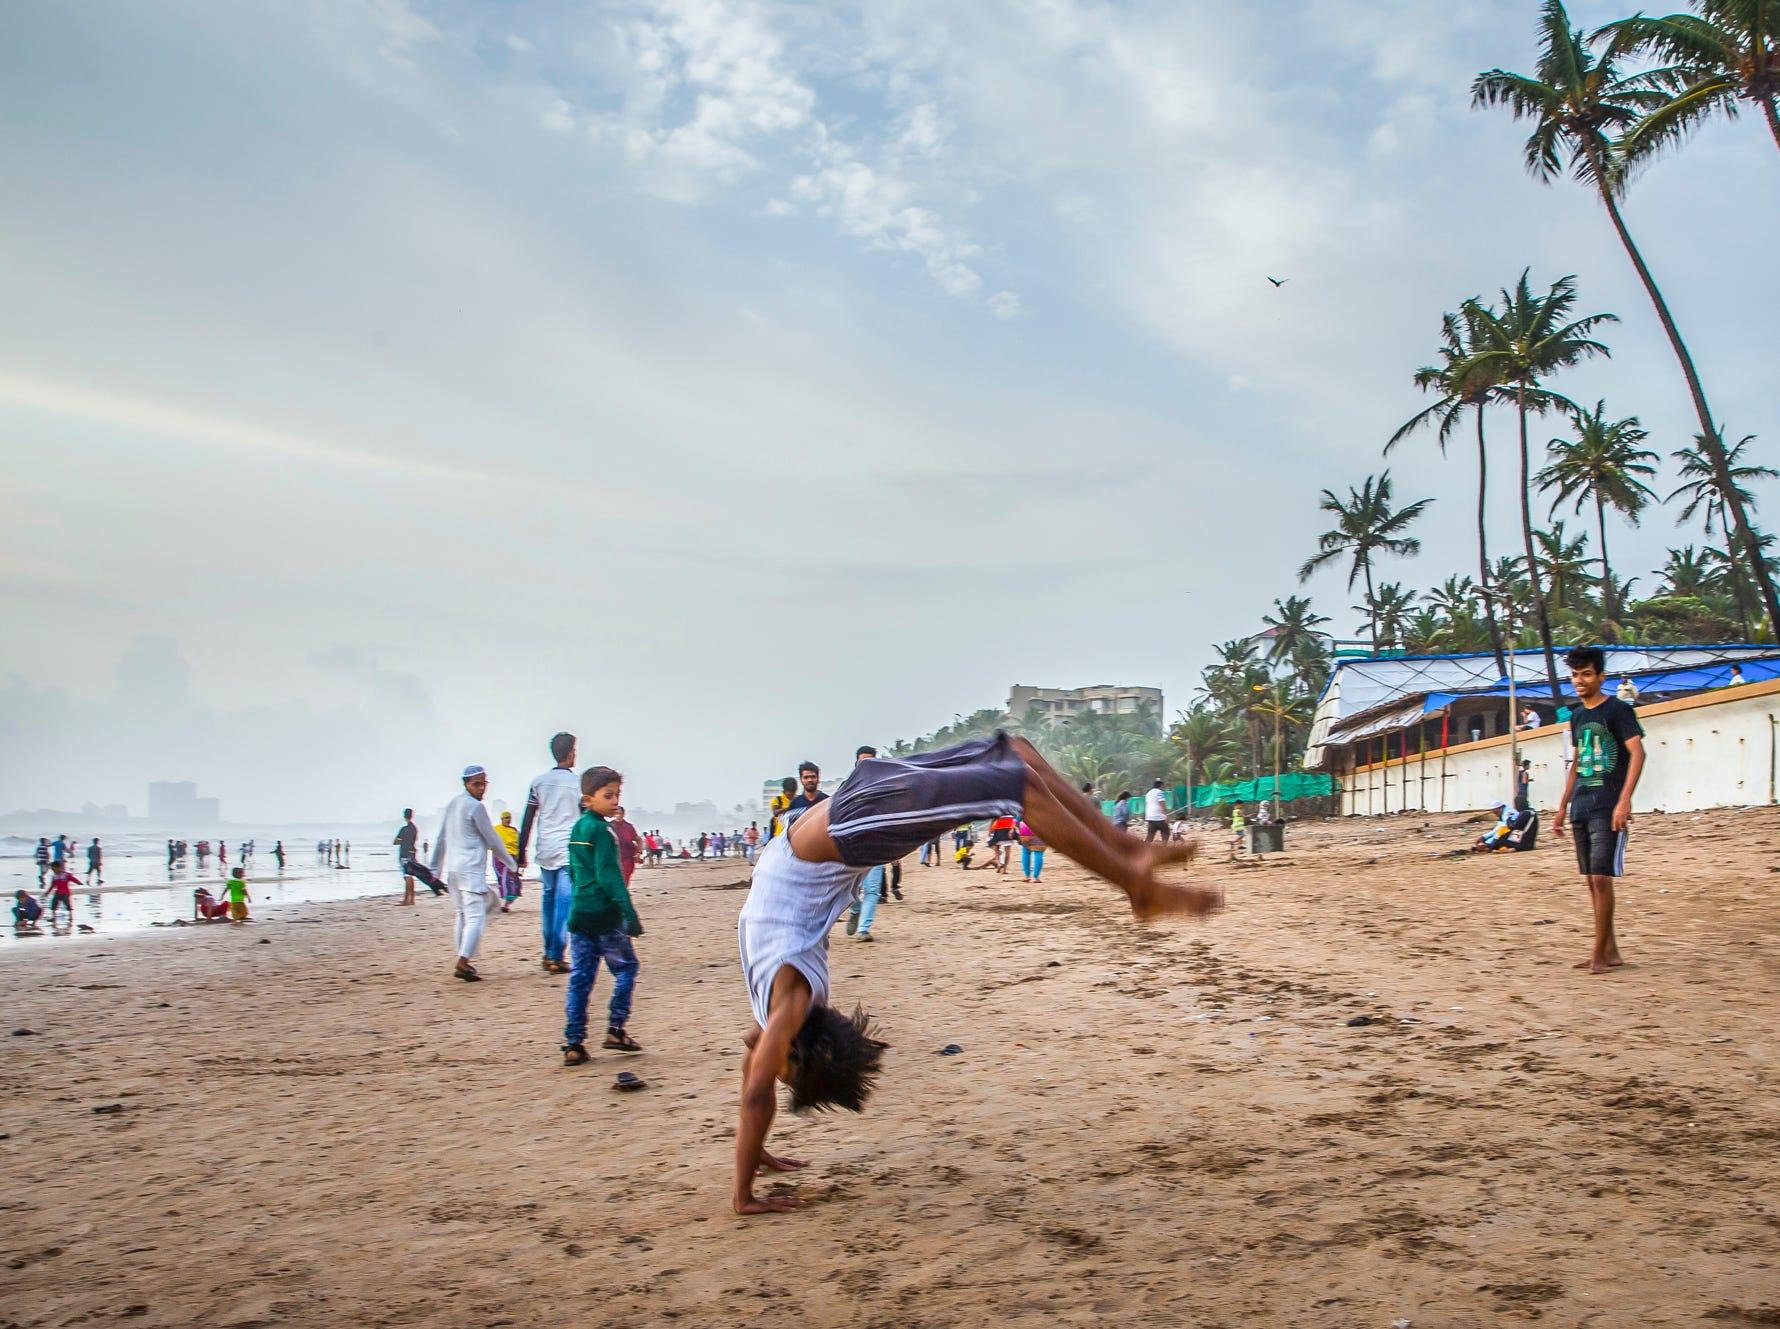 During a break in the monsoon rains, Salman Khan, 17, flips down Juhu Beach in Mumbai, India.